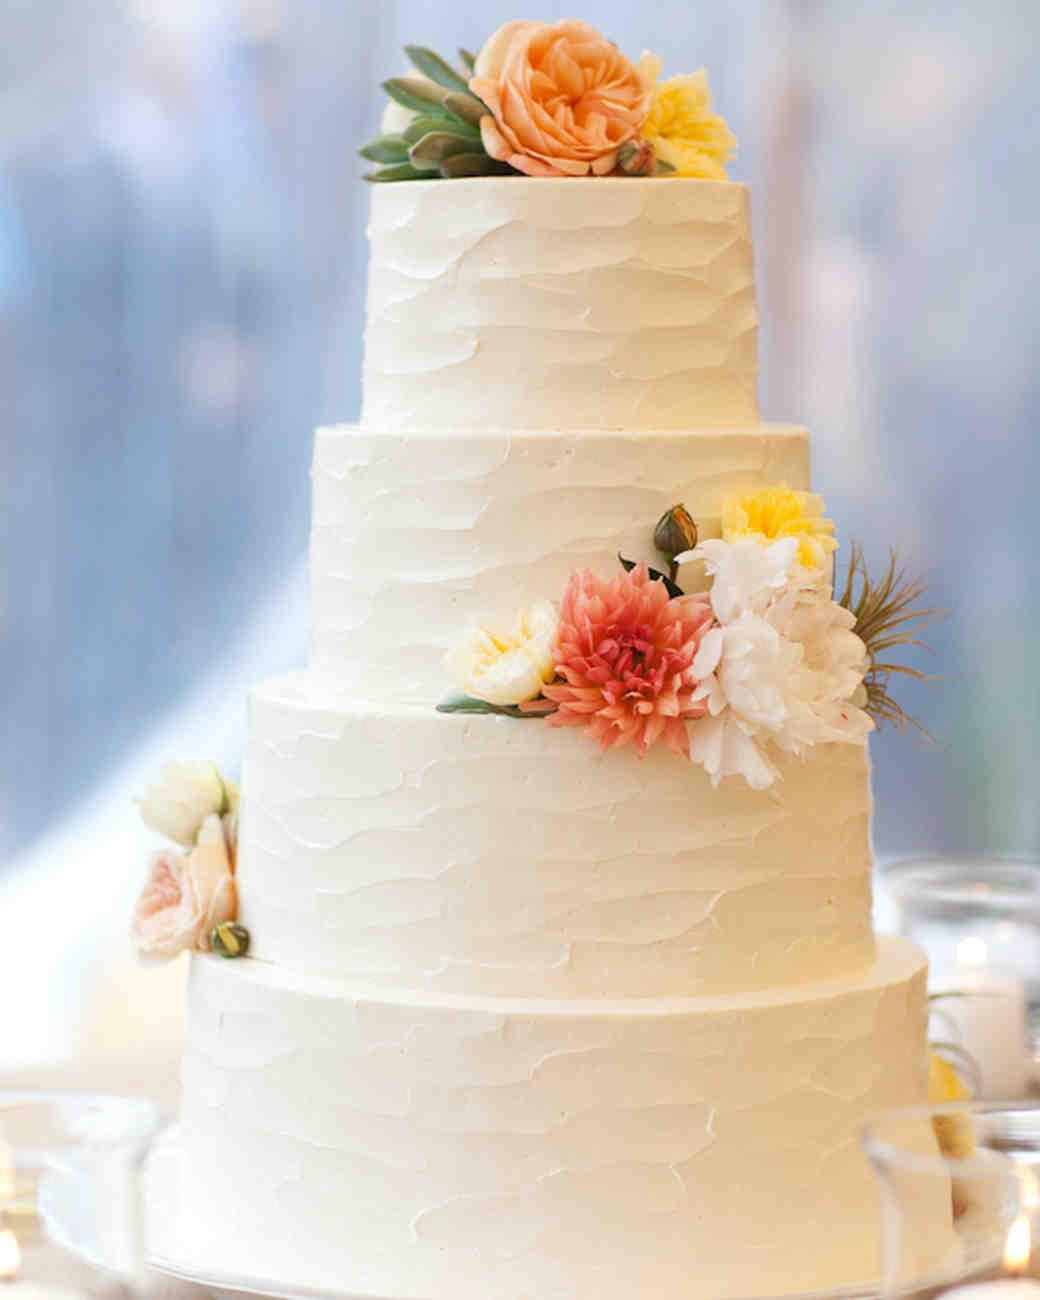 White Wedding Cake Frosting  104 White Wedding Cakes That Make the Case for Going